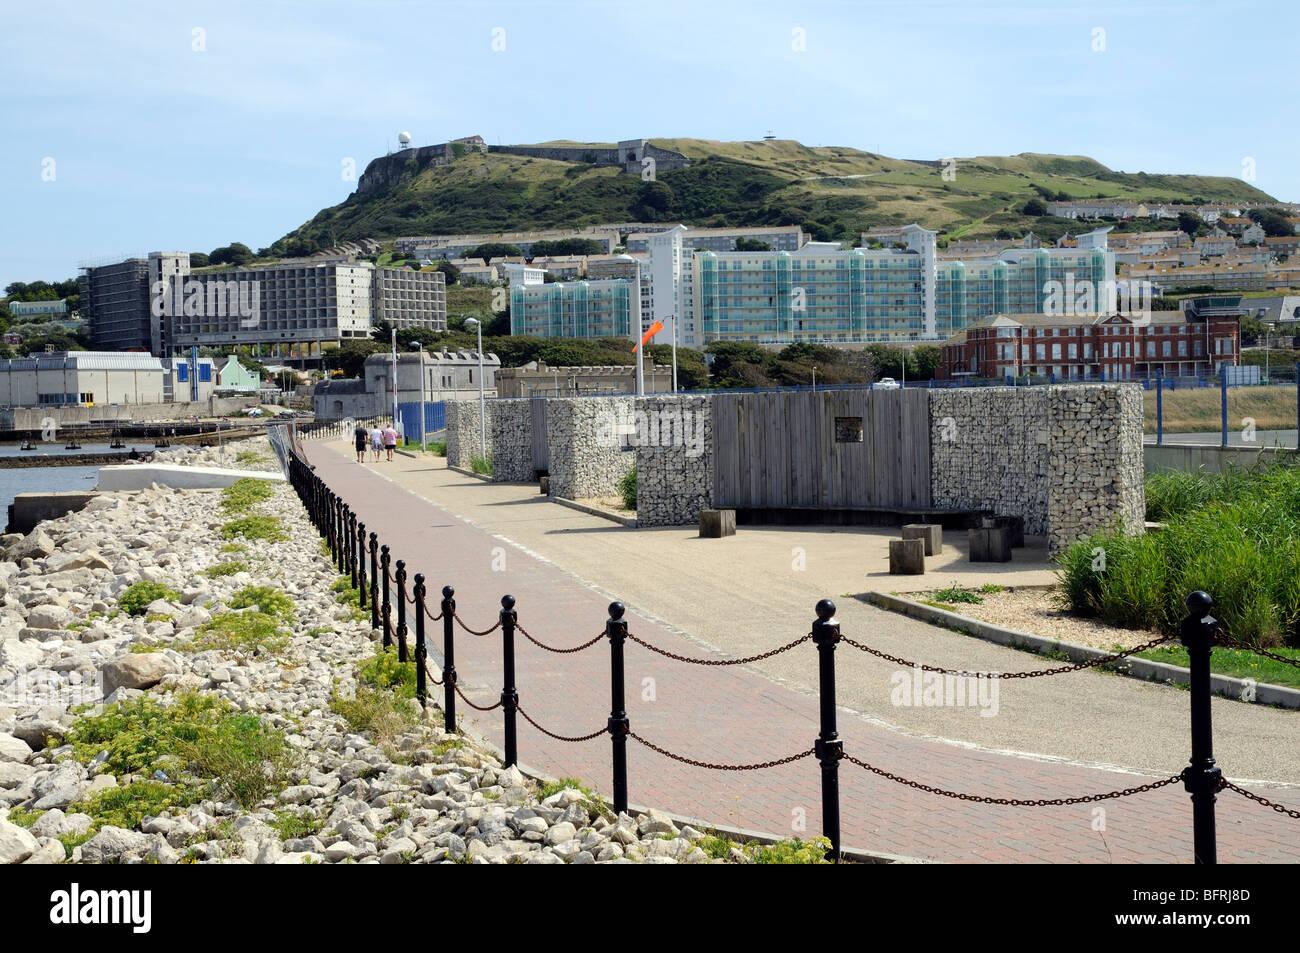 Waterfront pedestrian walkway looking towards Portland Castle Dorset southern England UK Building development - Stock Image